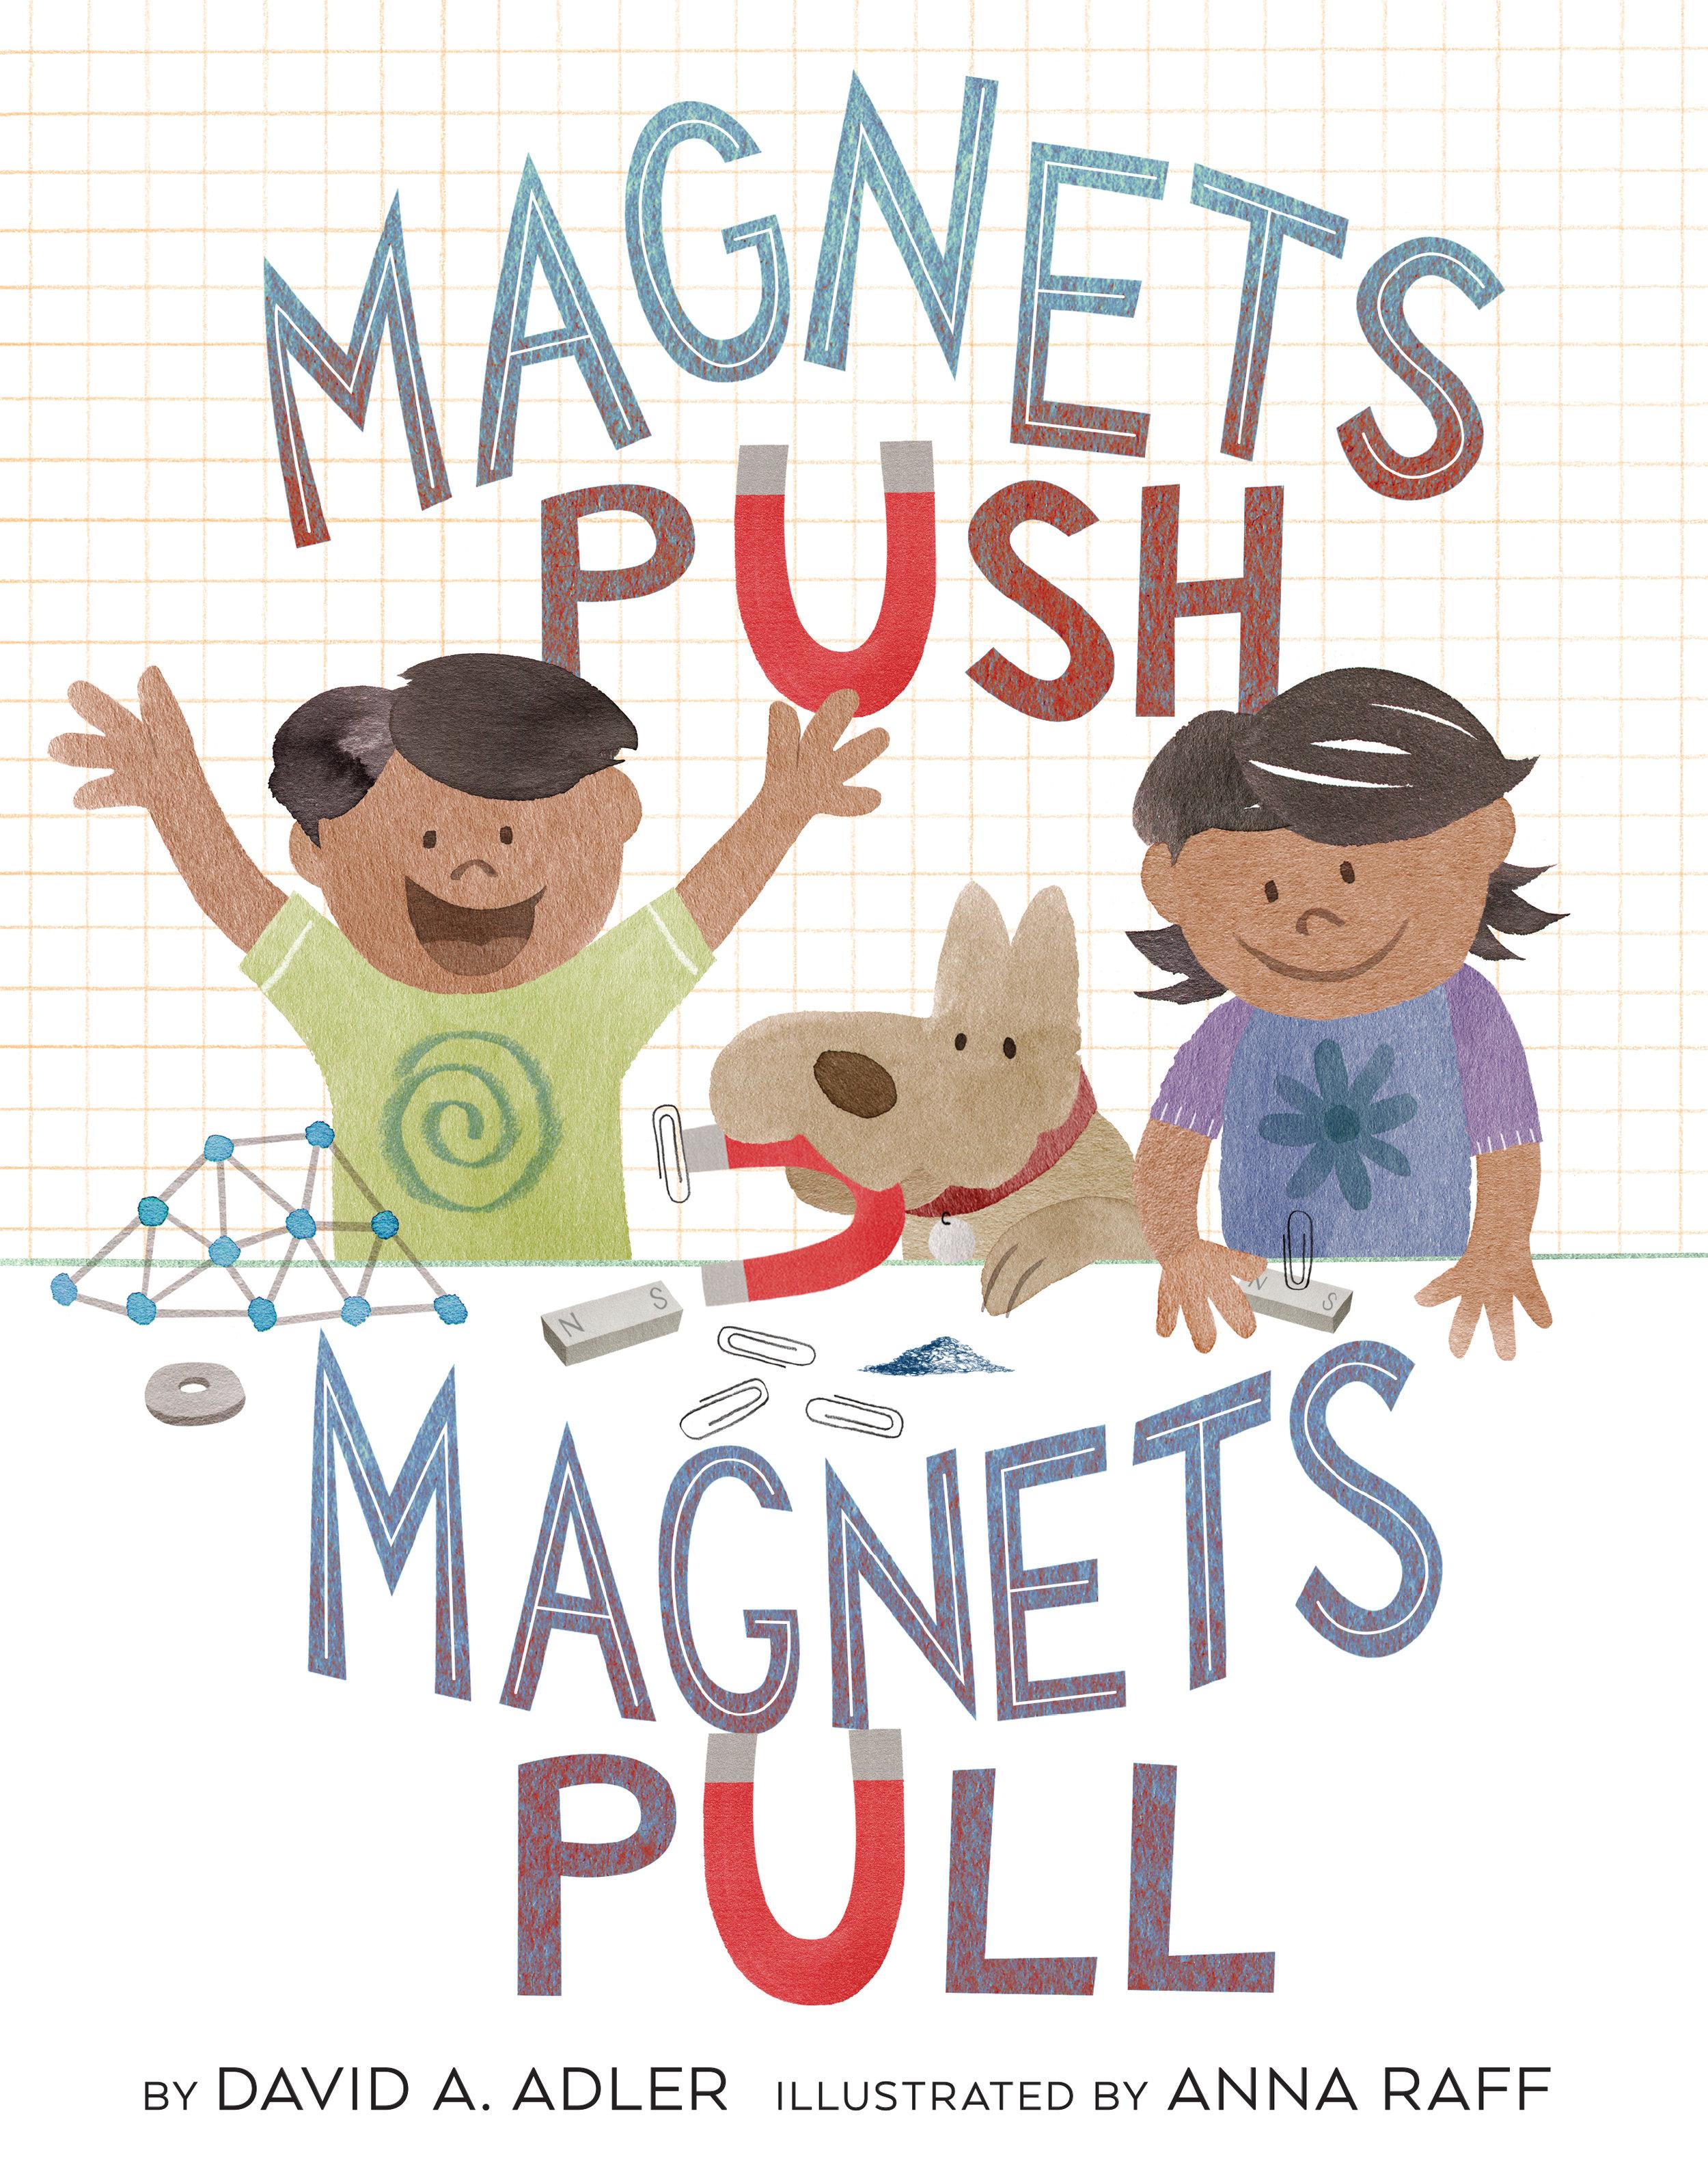 MagnetsPushMagnetsPull.jpg